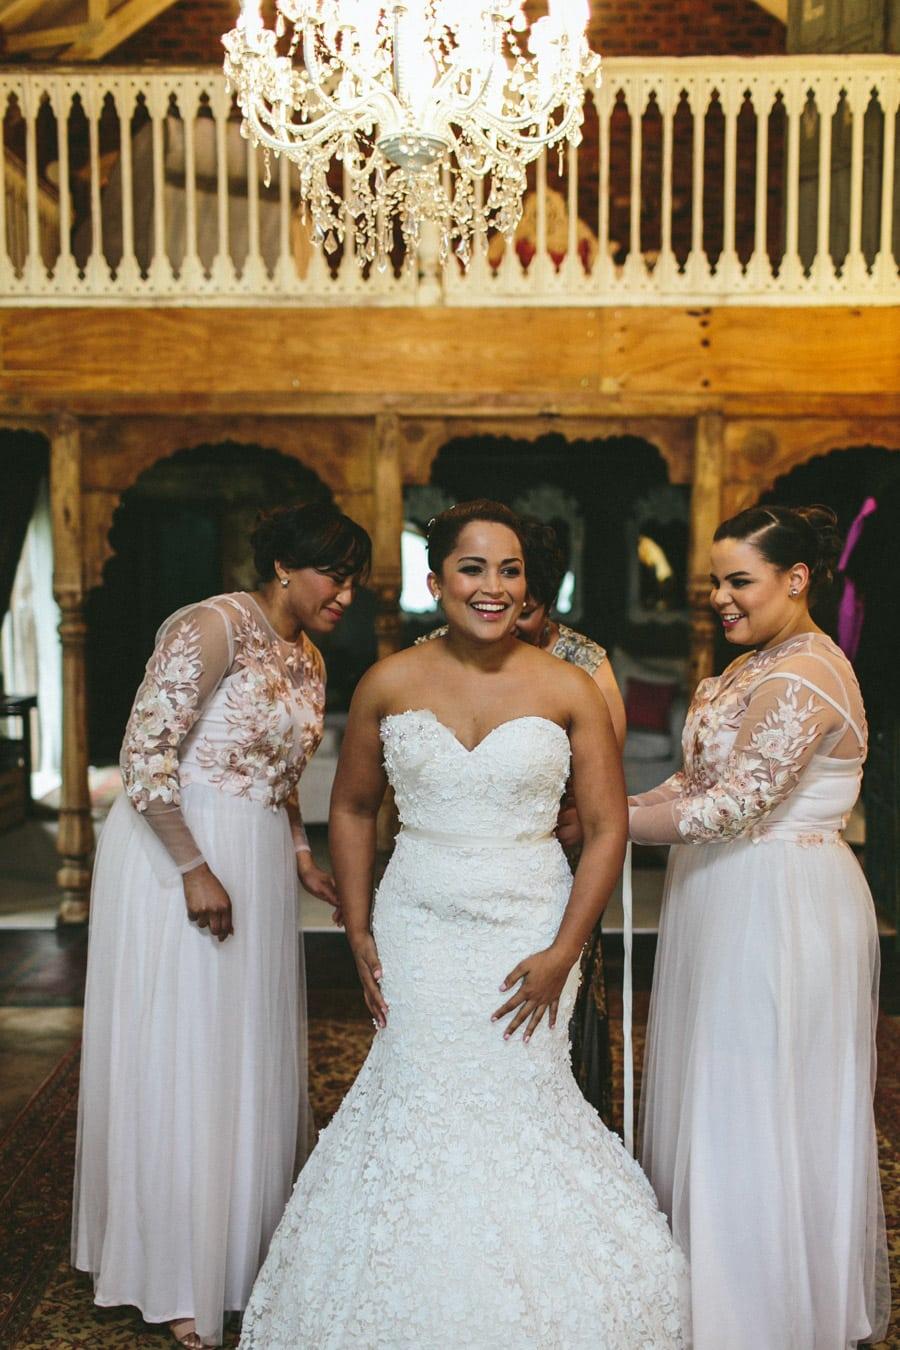 ro-dev_crystalbarn-documentary-wedding-photography-042